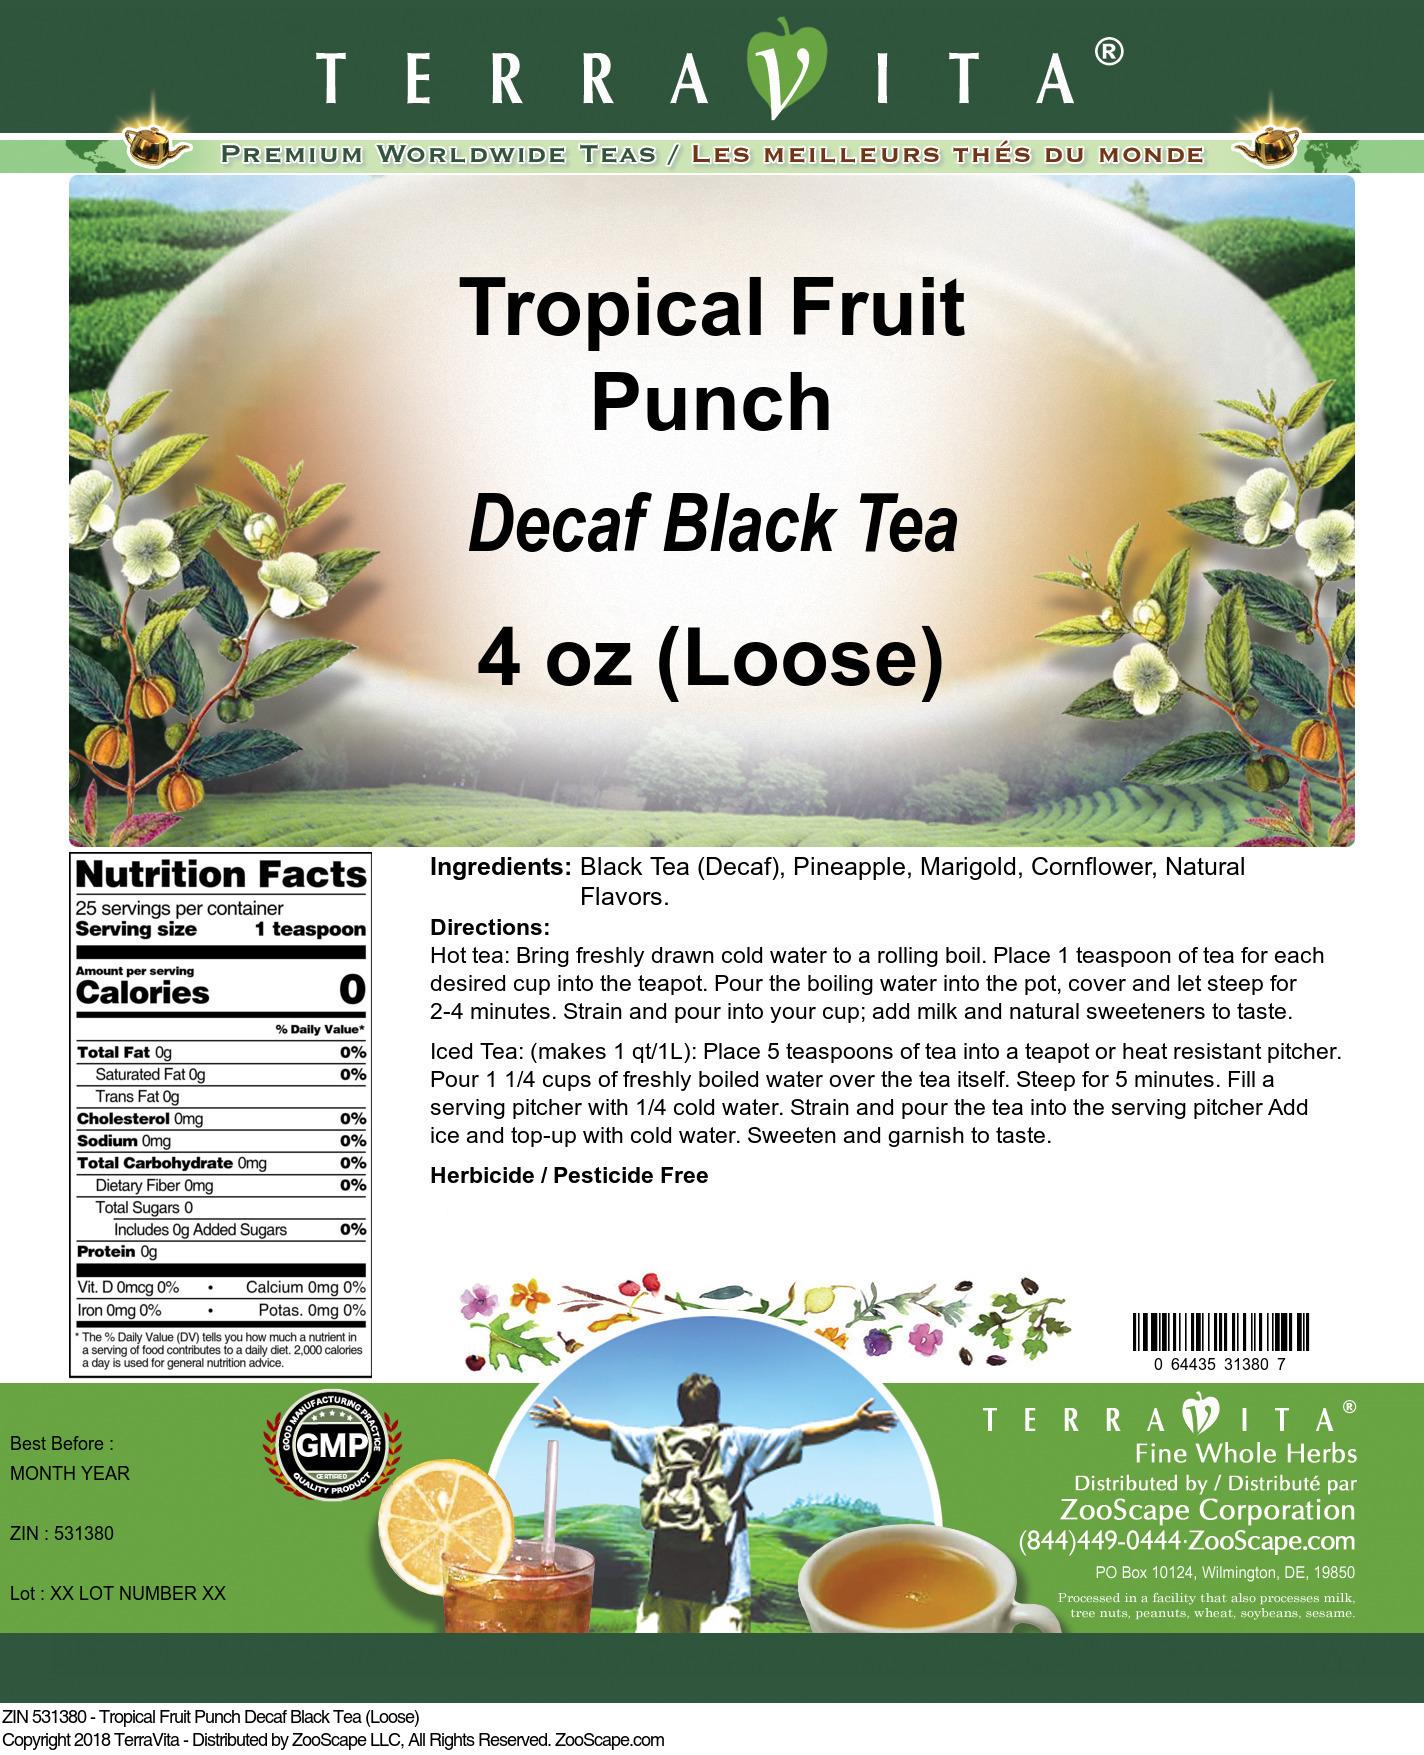 Tropical Fruit Punch Decaf Black Tea